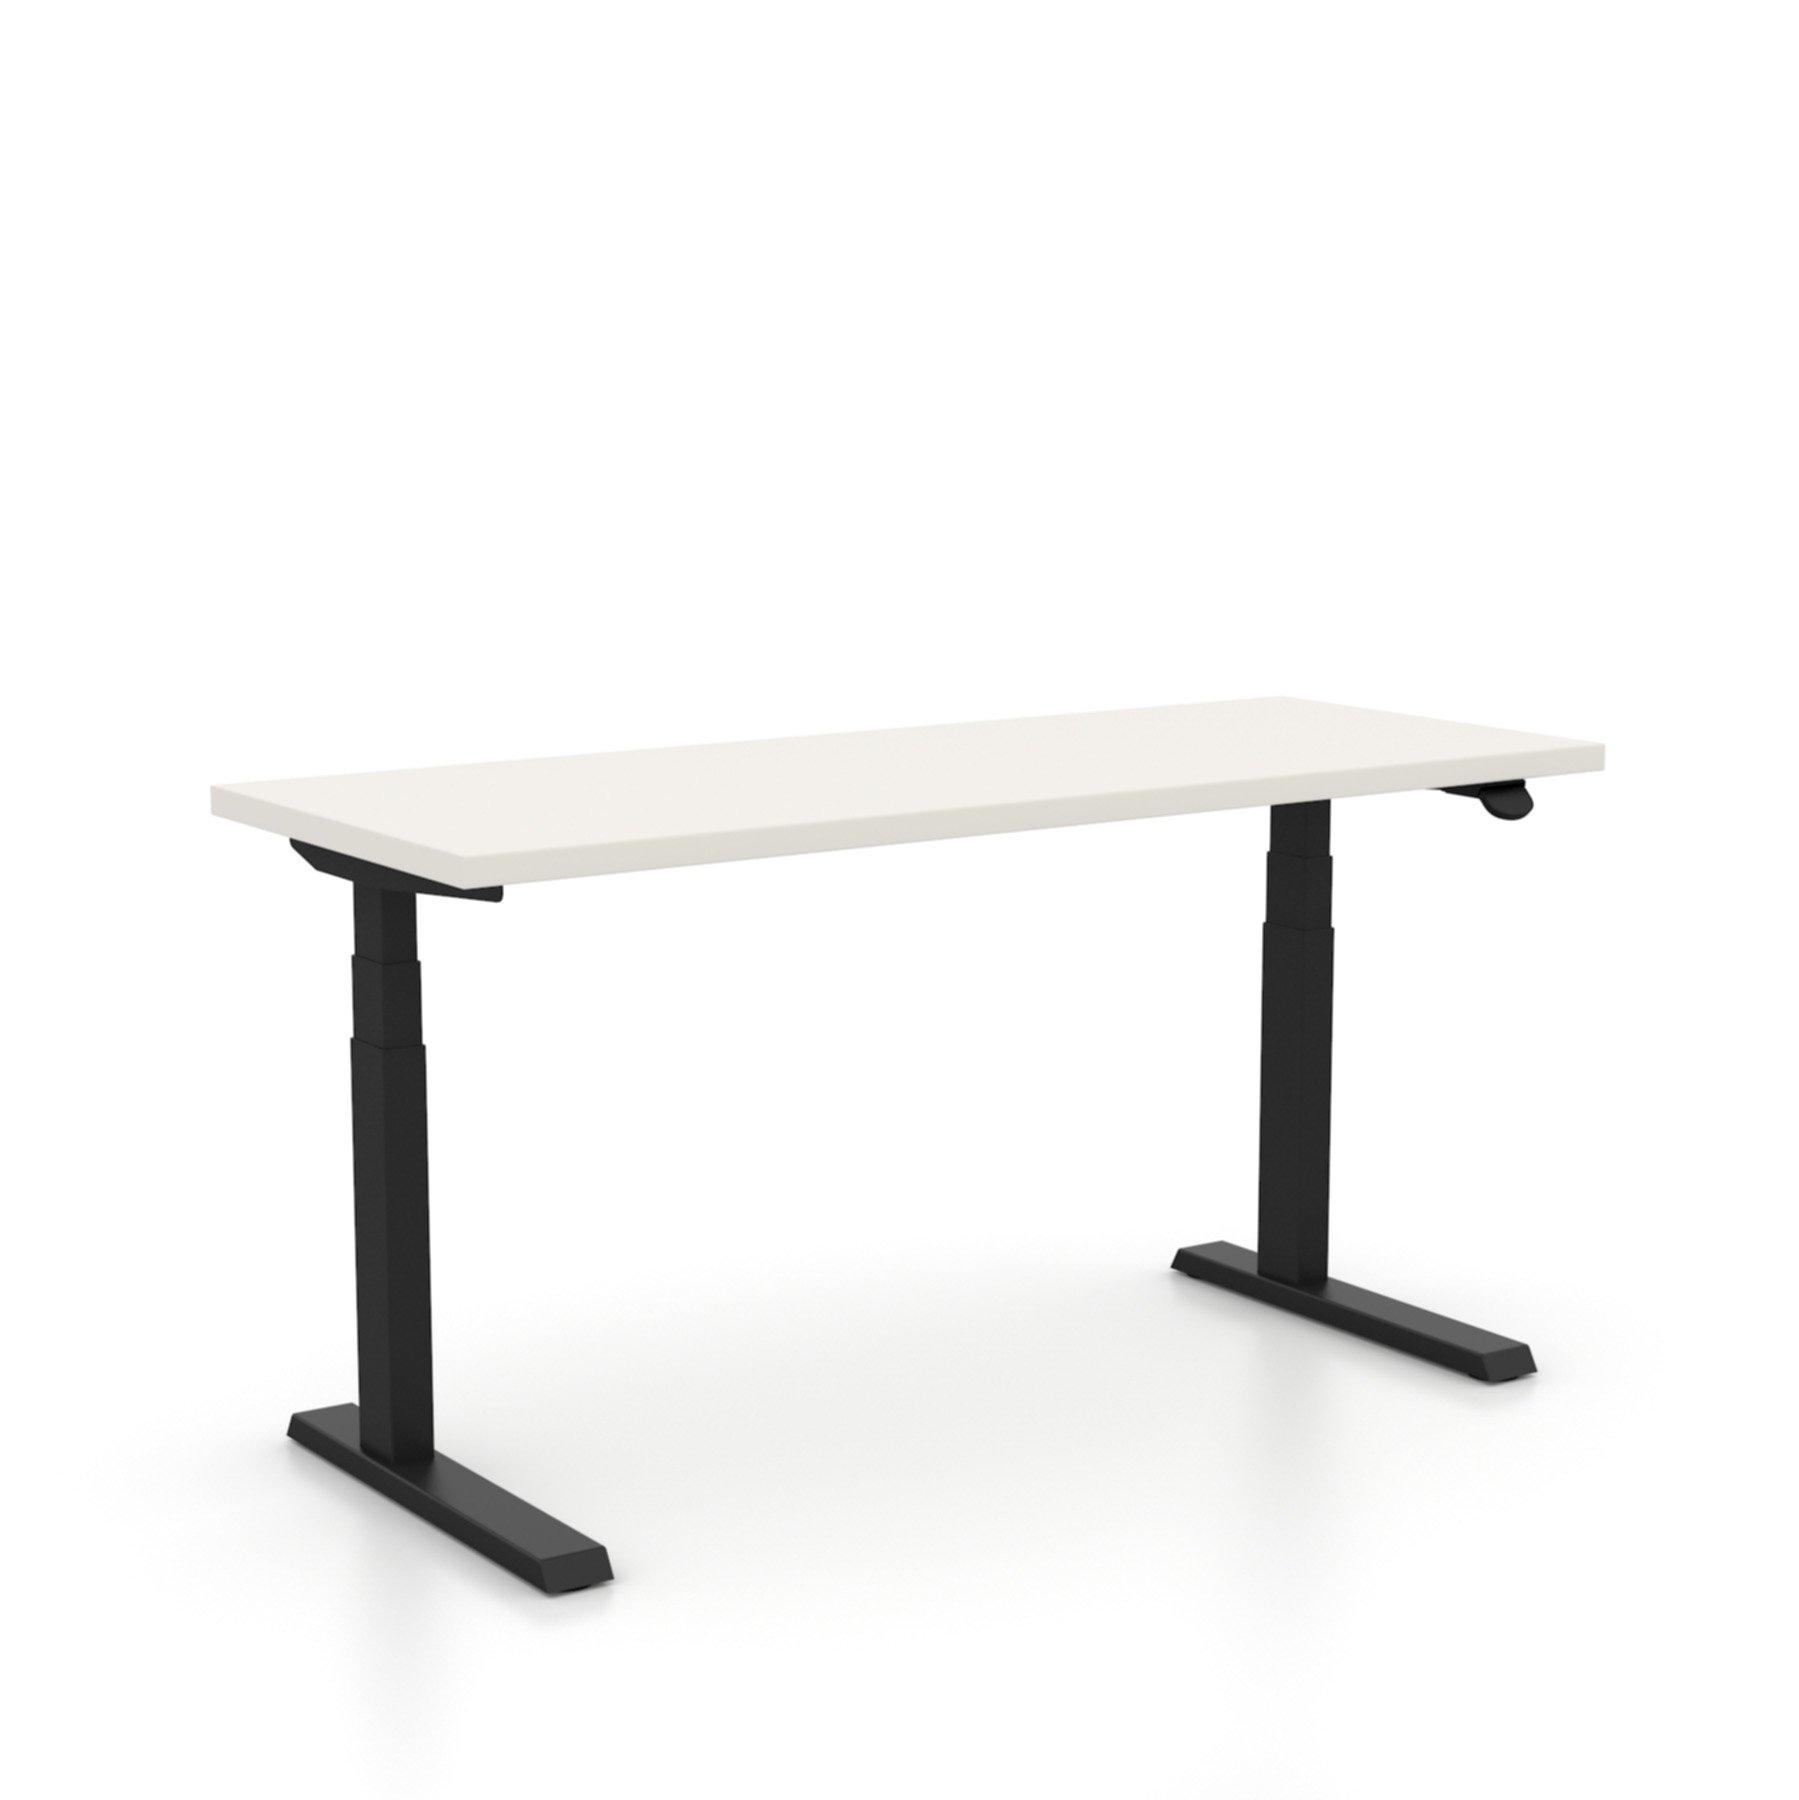 Haworth Upside Sit-to-Stand - 23